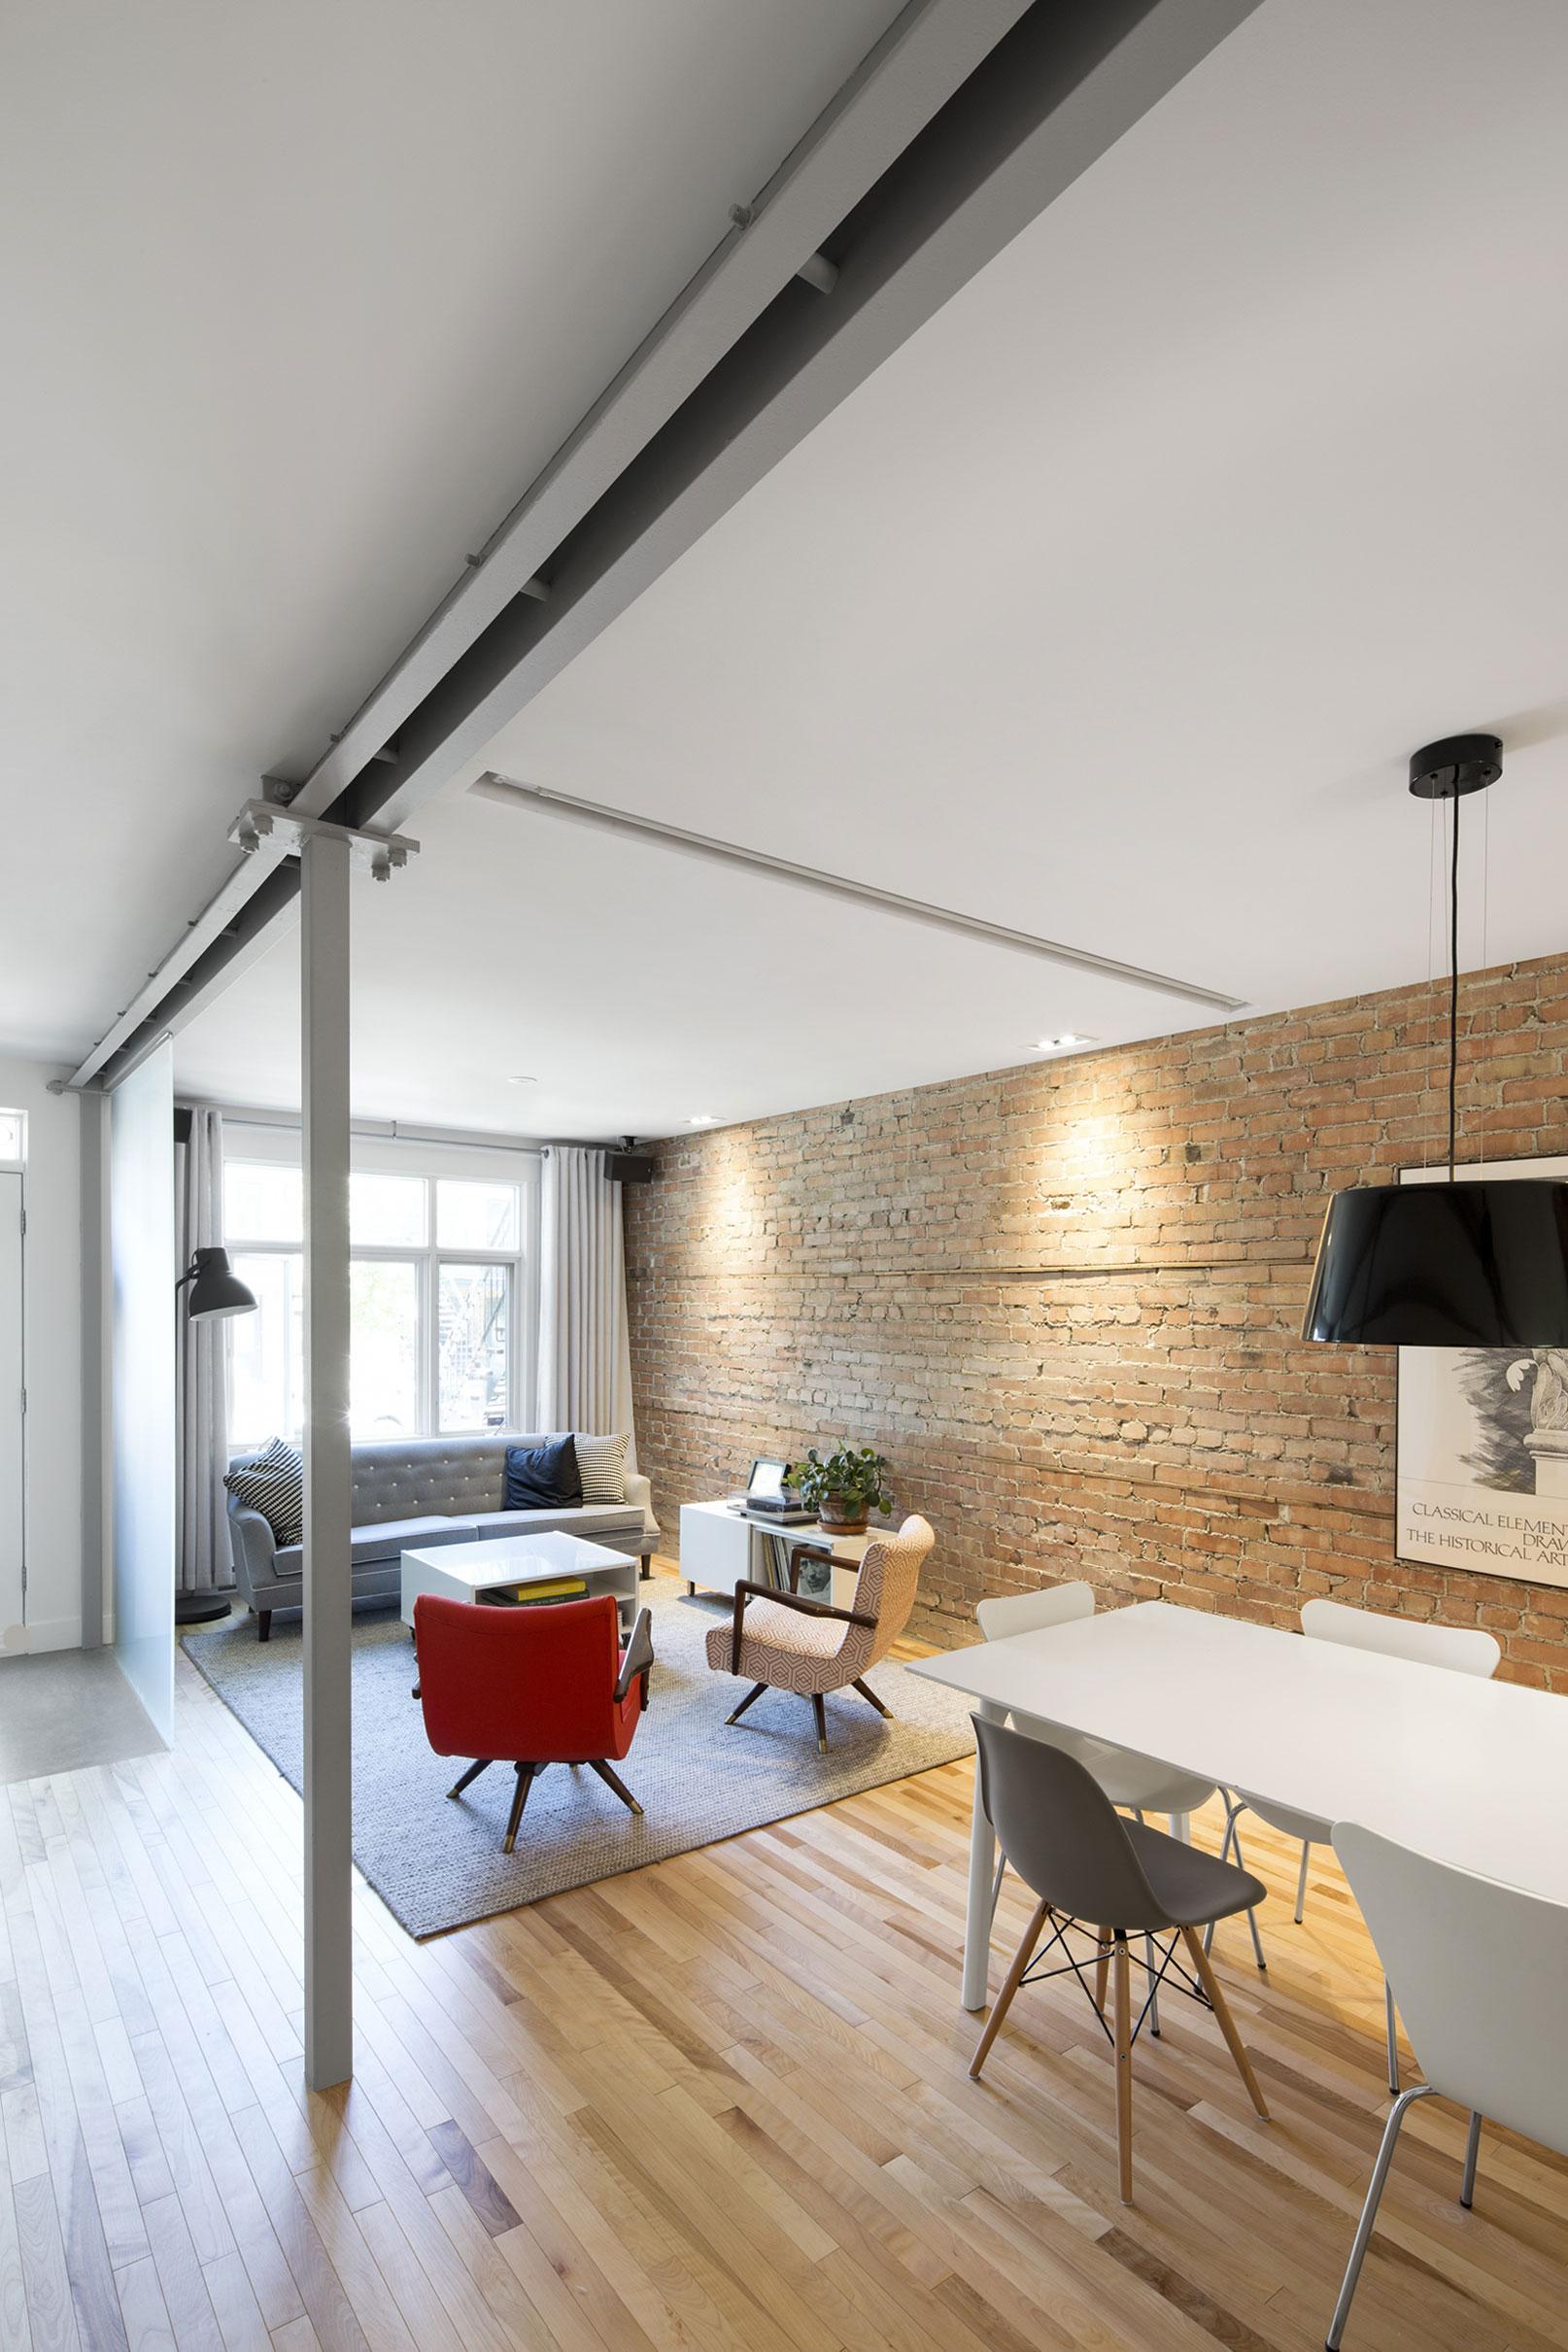 867 De Bougainville Apartment by Bourgeois:Lechasseur architects-01